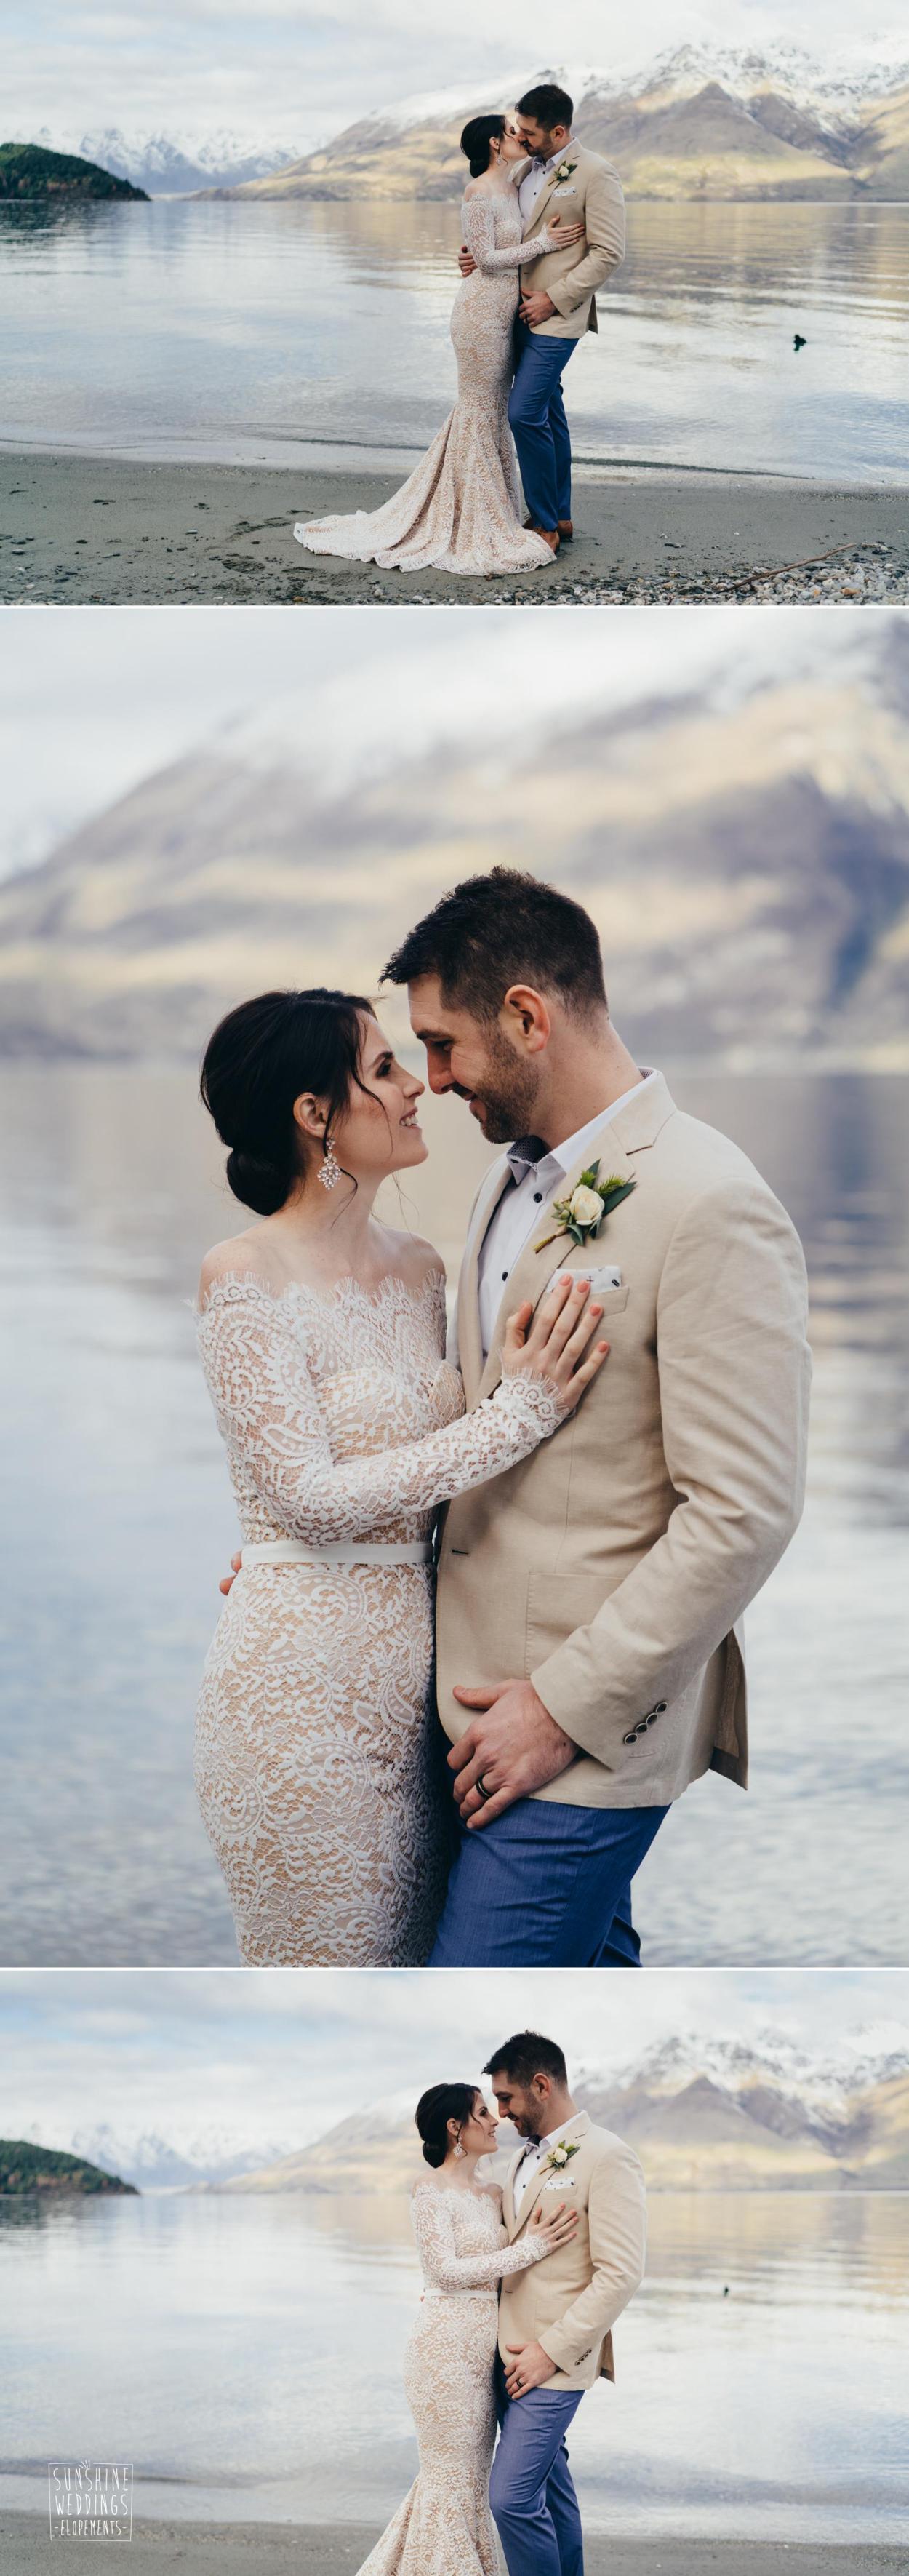 Elopement photographyer New Zealand